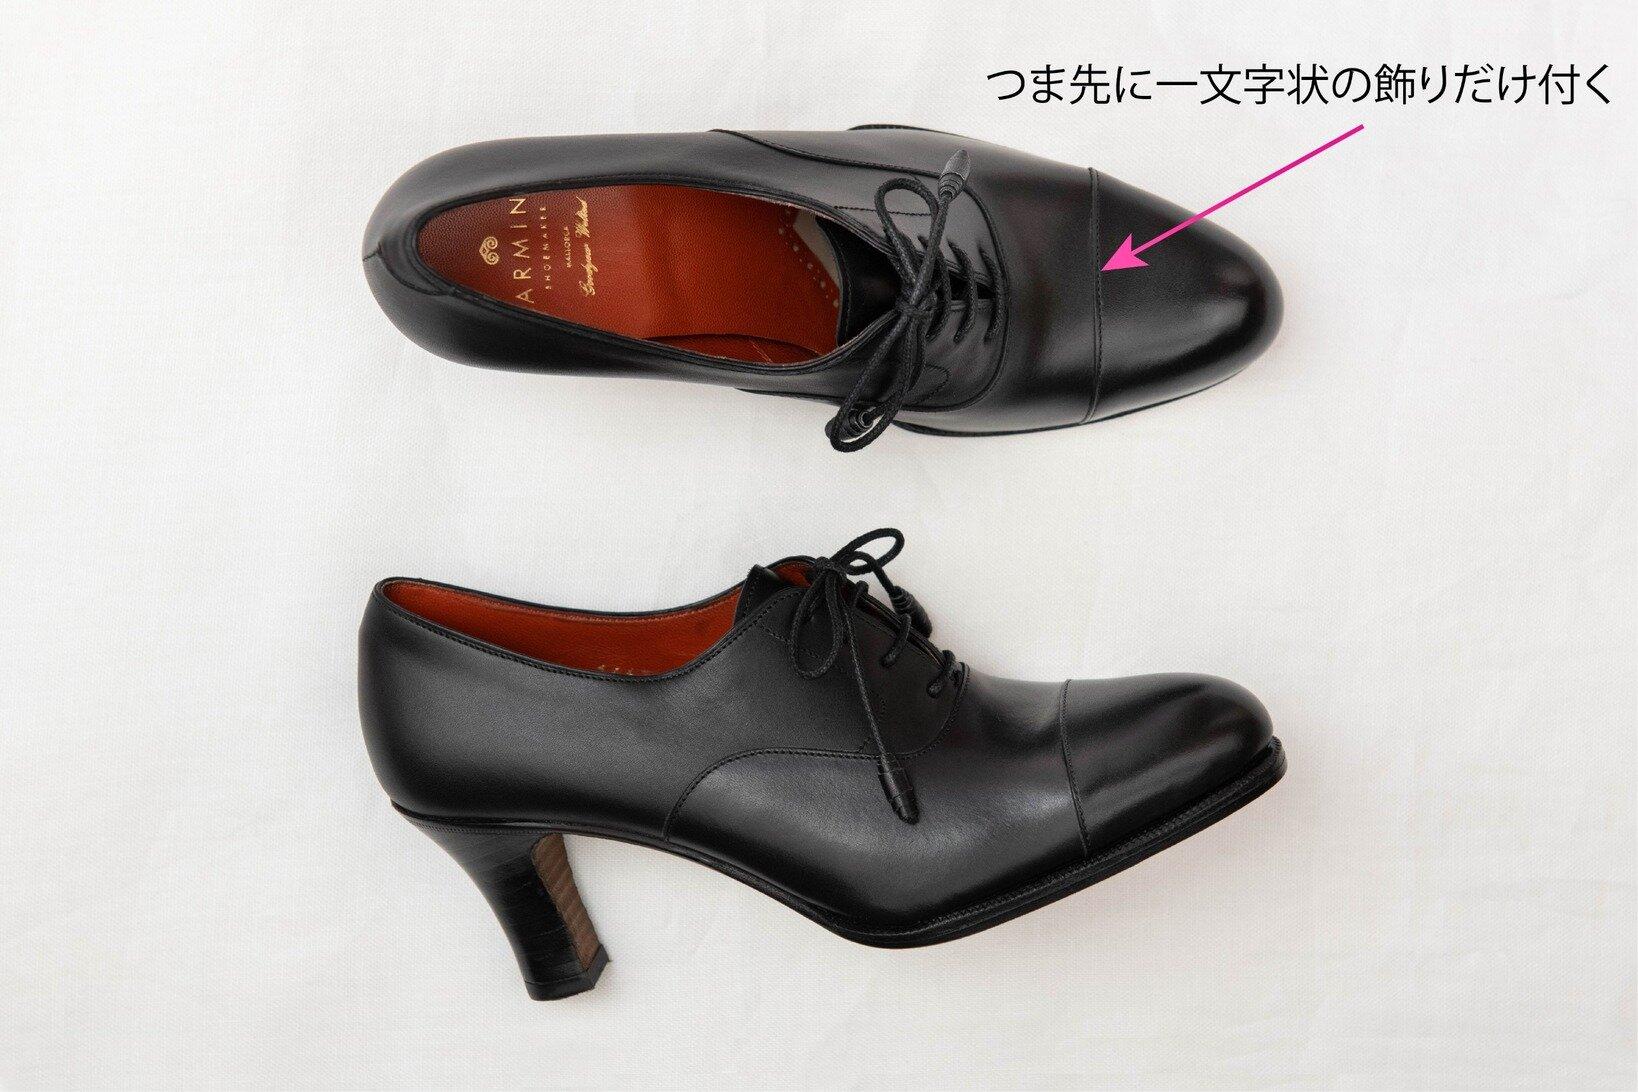 "「<a href=https://www.tradingpost-online.jp/fs/tradingpost/carmina/ADJ1463004_NEGRO target='_blank'>1463</a>」¥62,000+税/カルミーナ(トレーディングポスト大阪店、トレーディングポスト青山本店) ▶︎靴の詳細は<a href=""https://muuseo.com/square/articles/1322"" target=""_blank"">連載第2回</a>をチェック!"